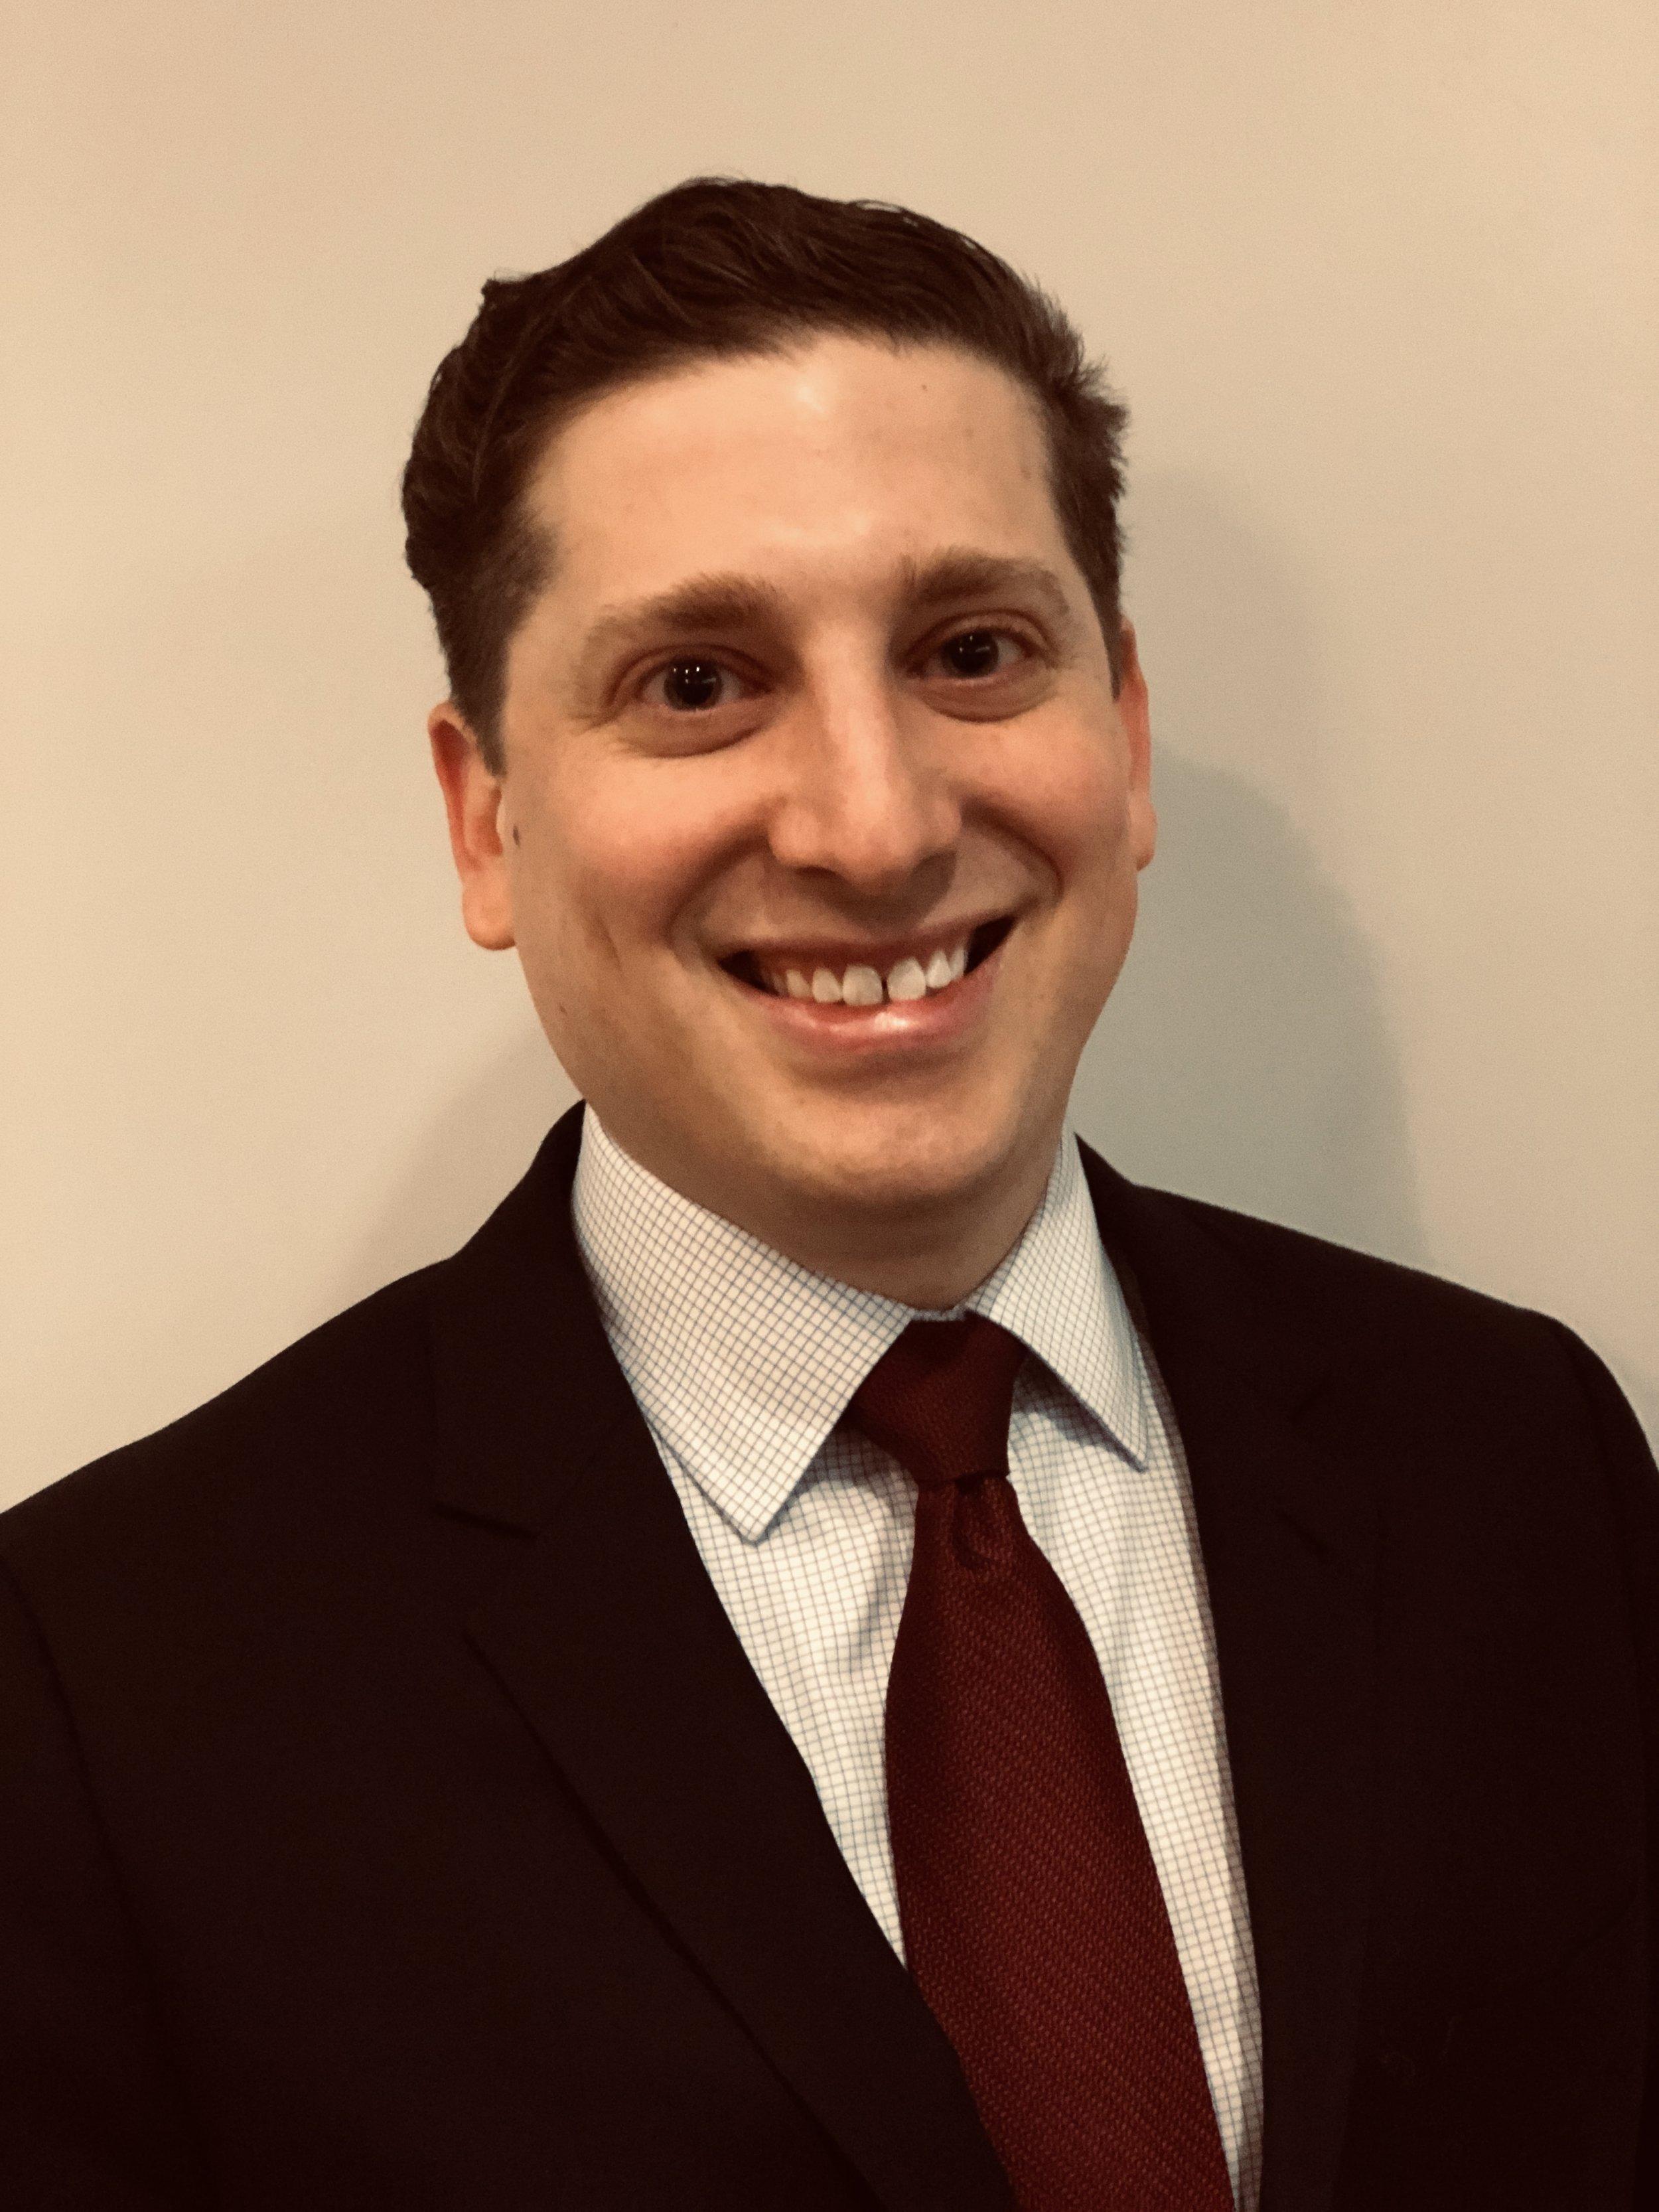 Daniel Abilevitz BNI3 Business Networking